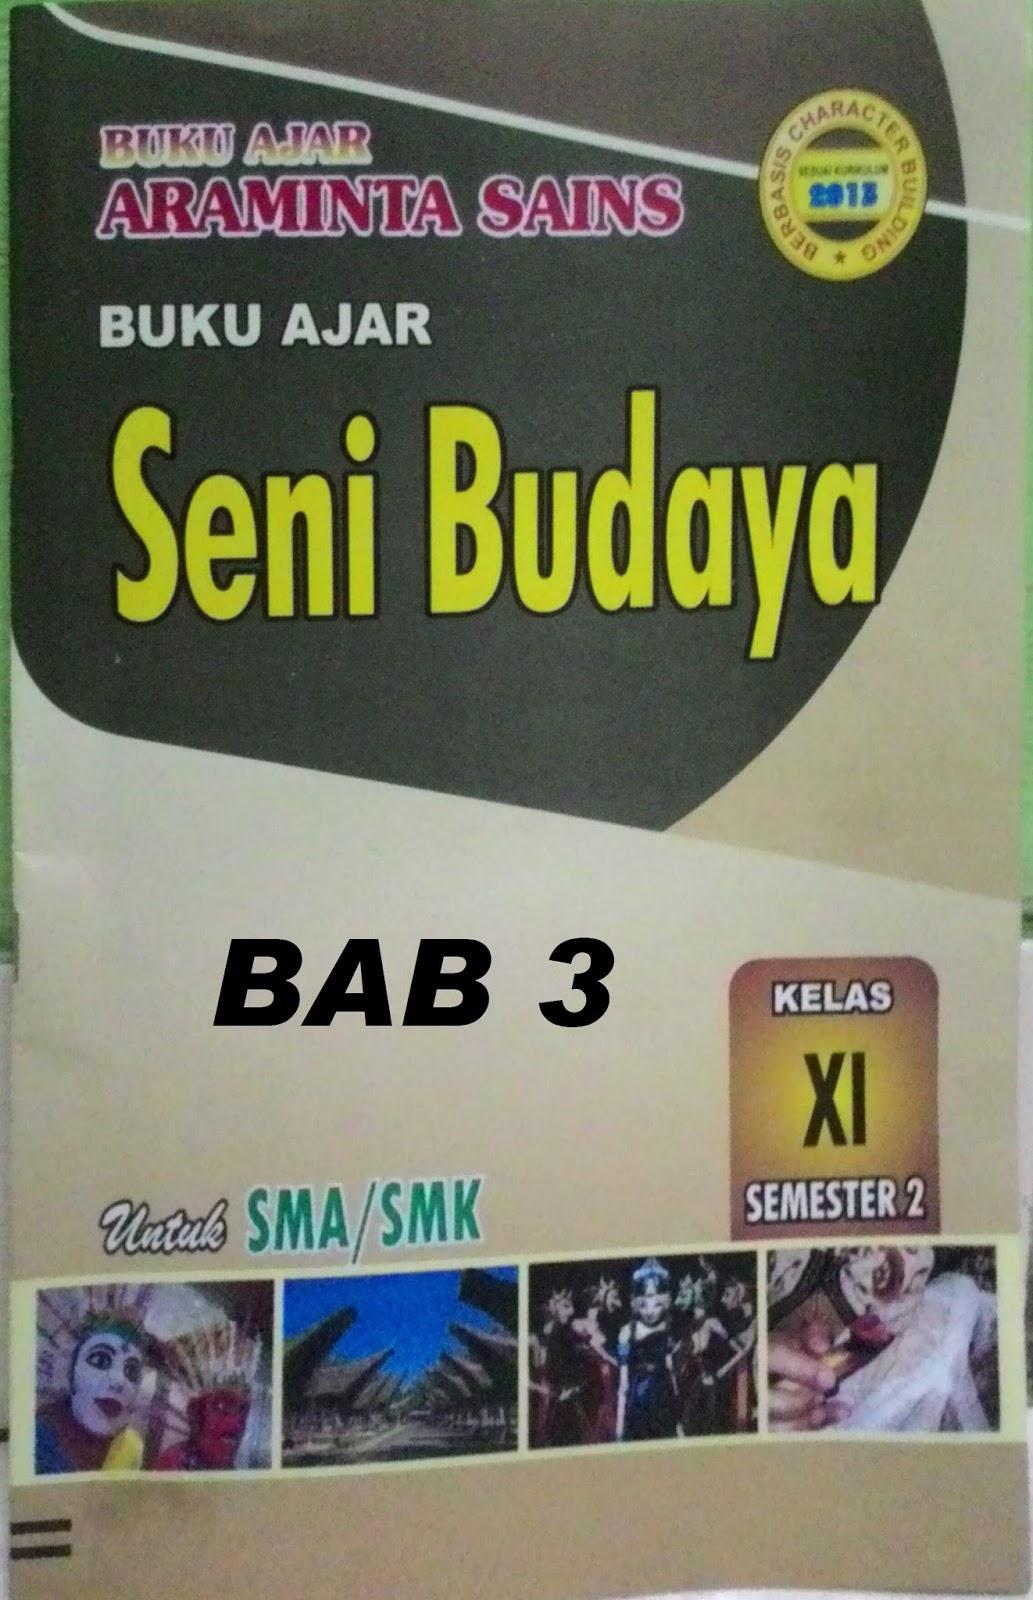 Kunci Jawaban LKS Seni Budaya Bab 3 kelas 11 Semester 2 ...